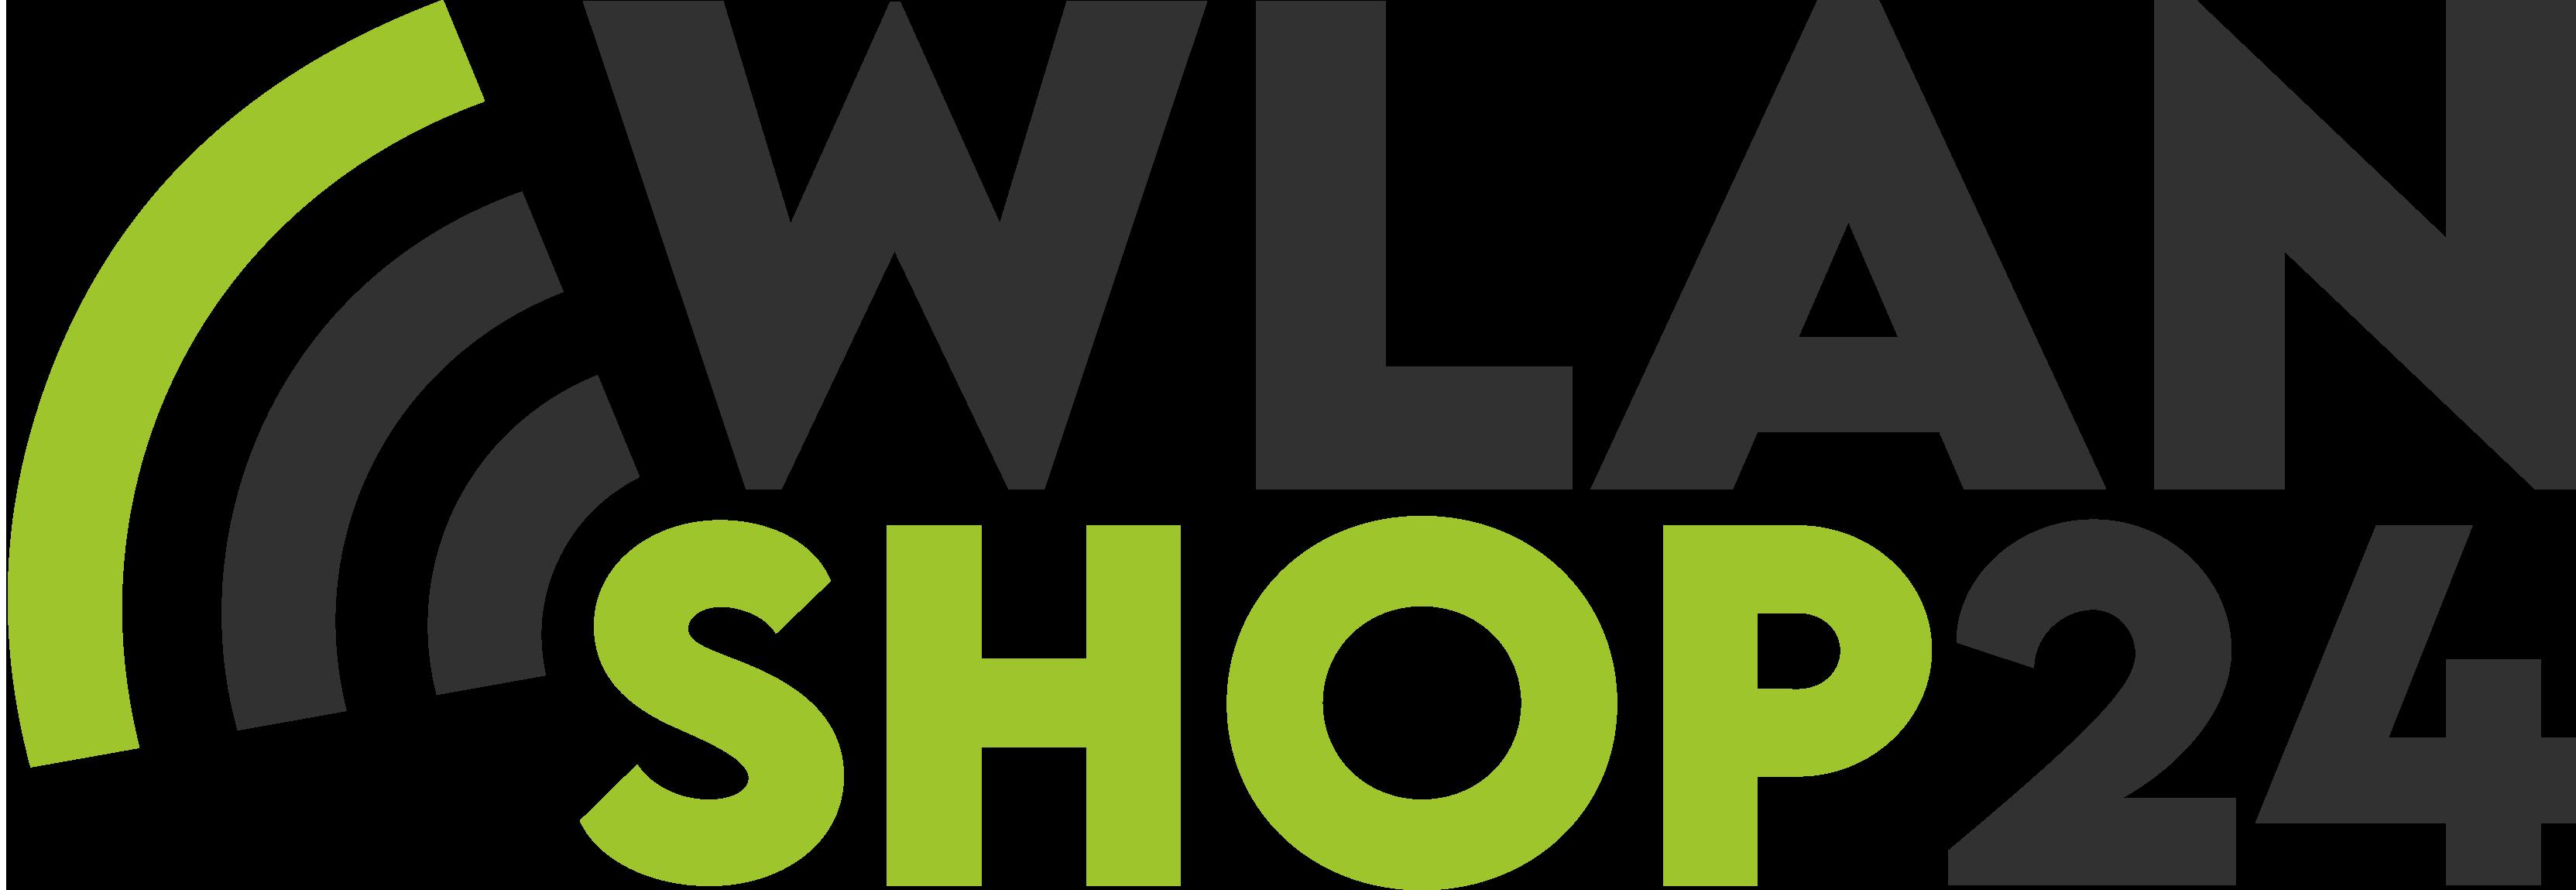 WLAN-SHOP24 Logo